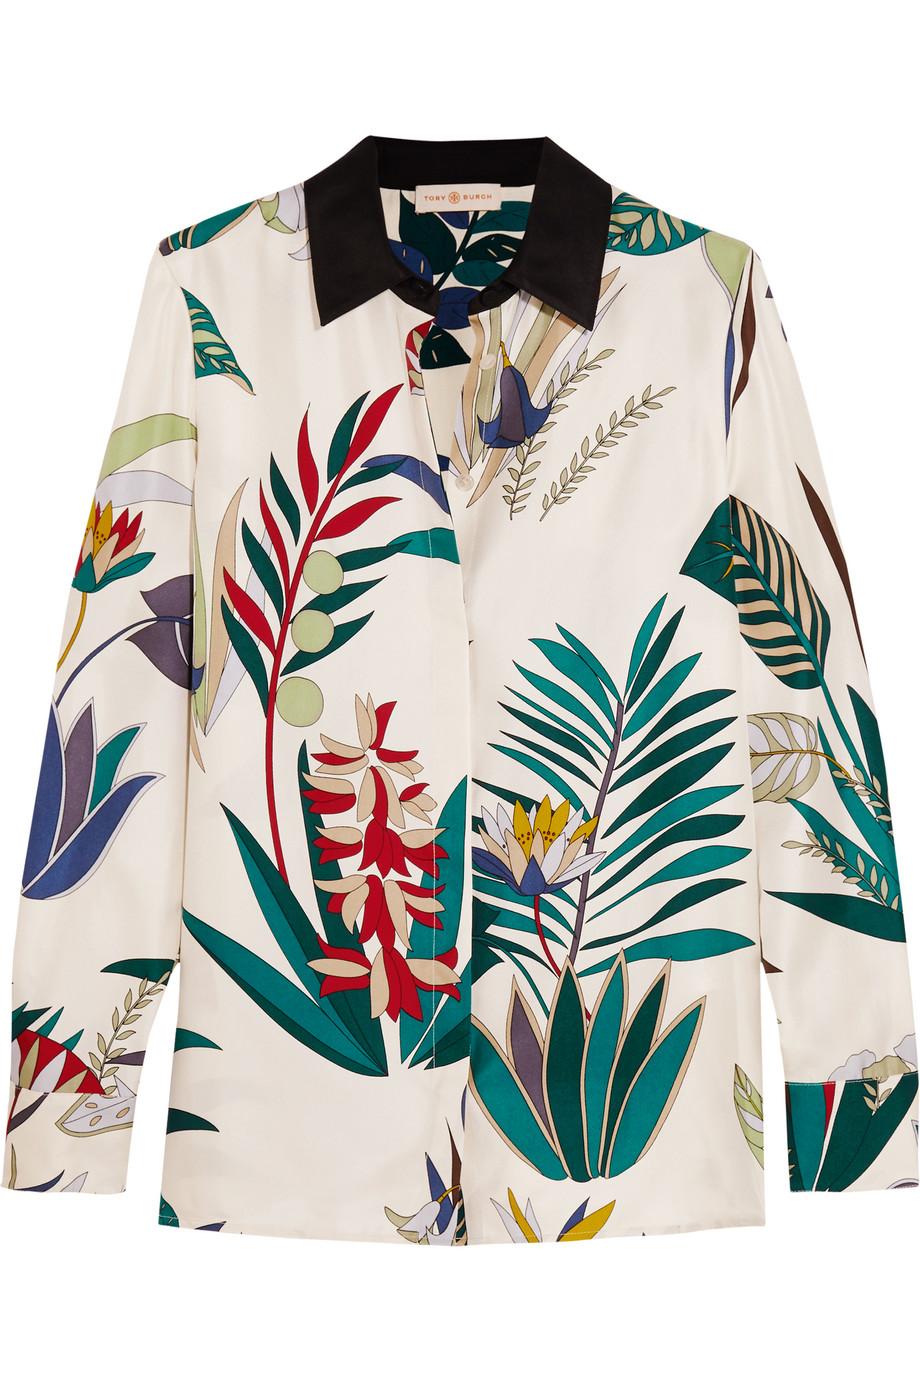 Tory Burch Madison Printed Silk-Twill Shirt, White, Women's, Size: 8